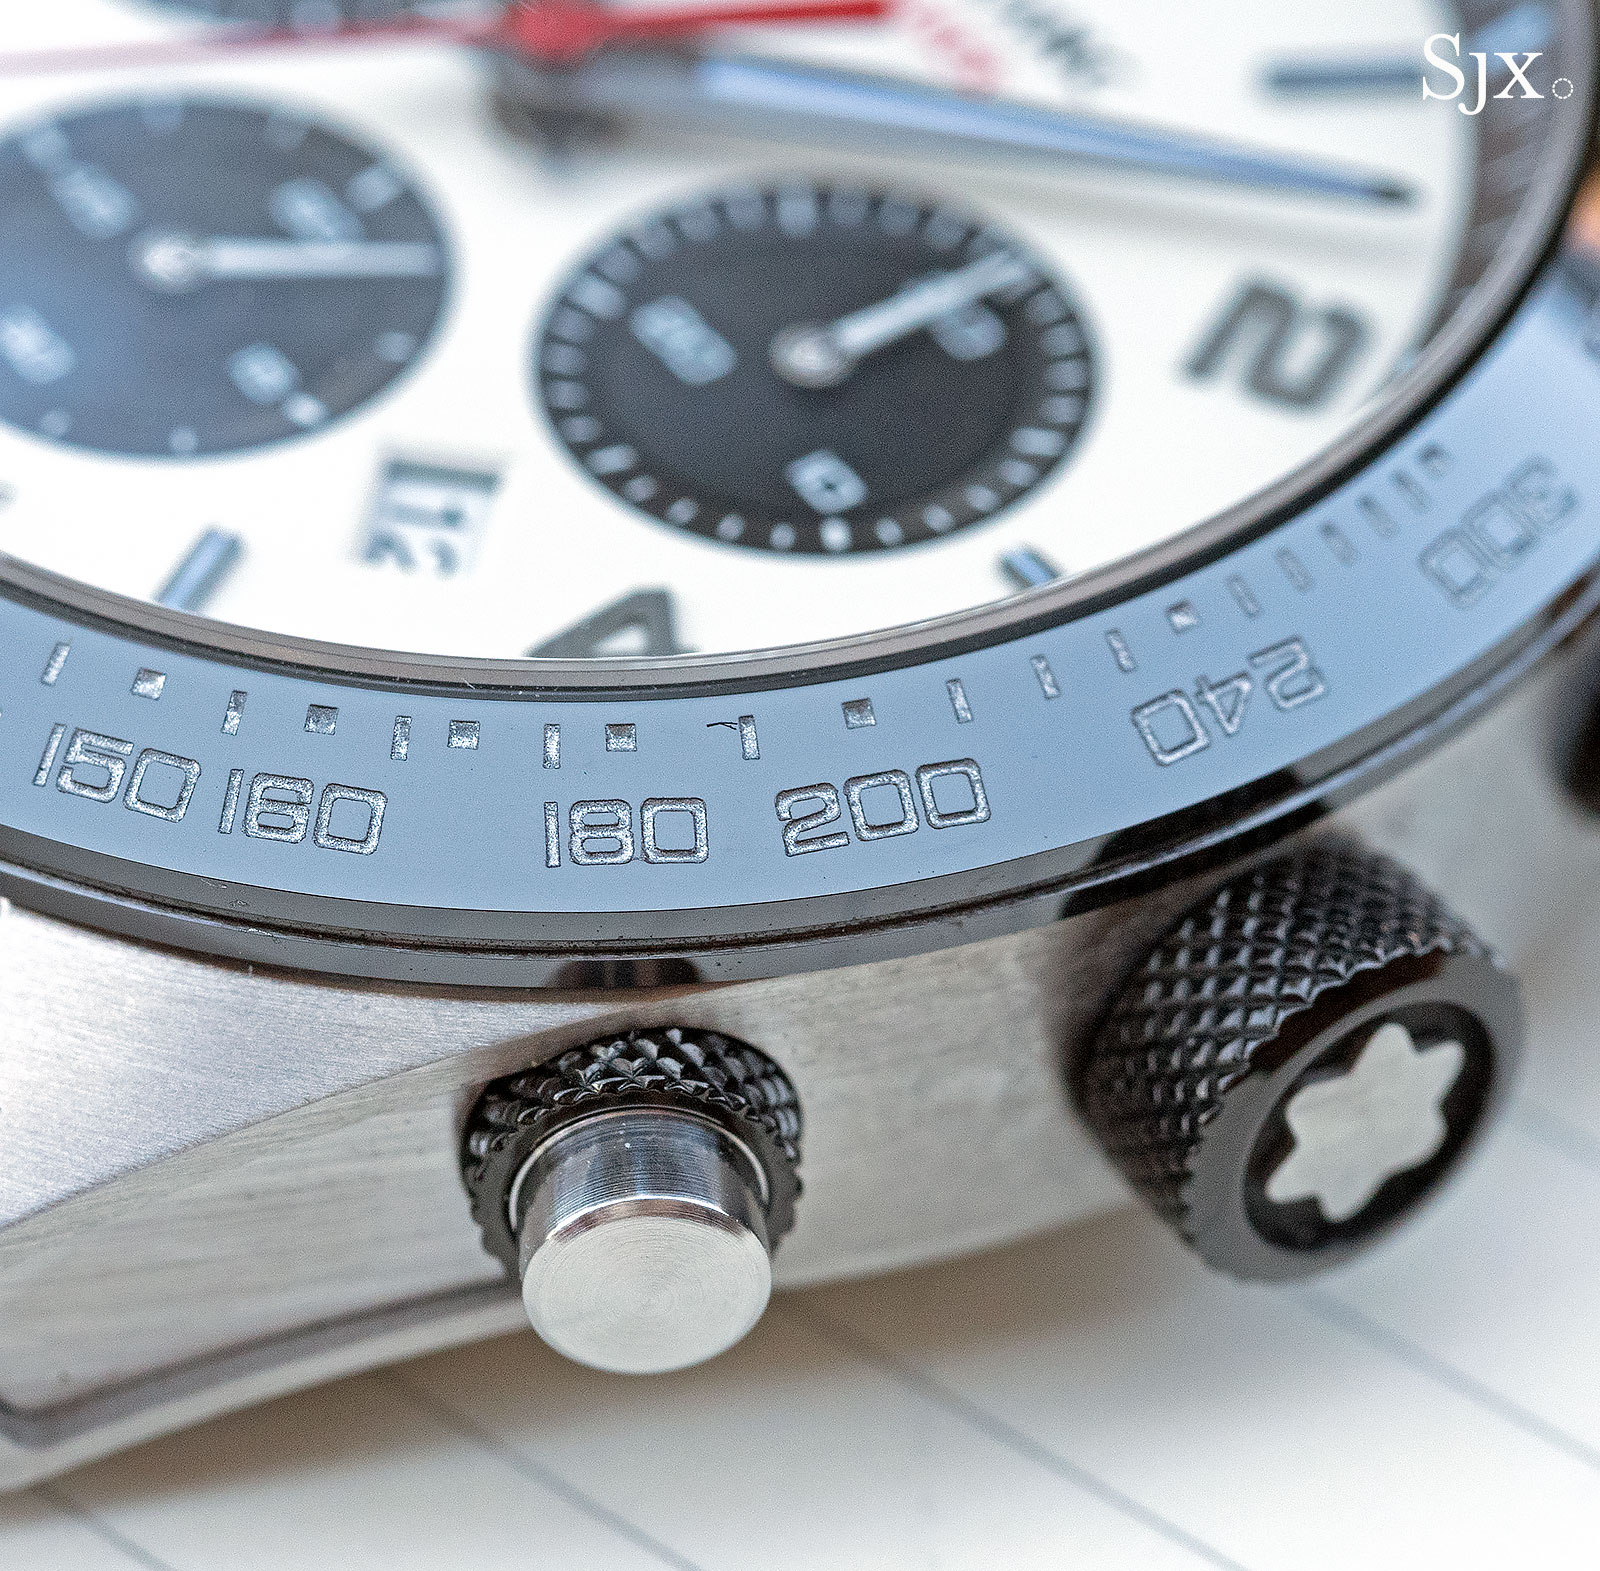 Montblanc Montblanc TimeWalker Manufacture Chronograph 4